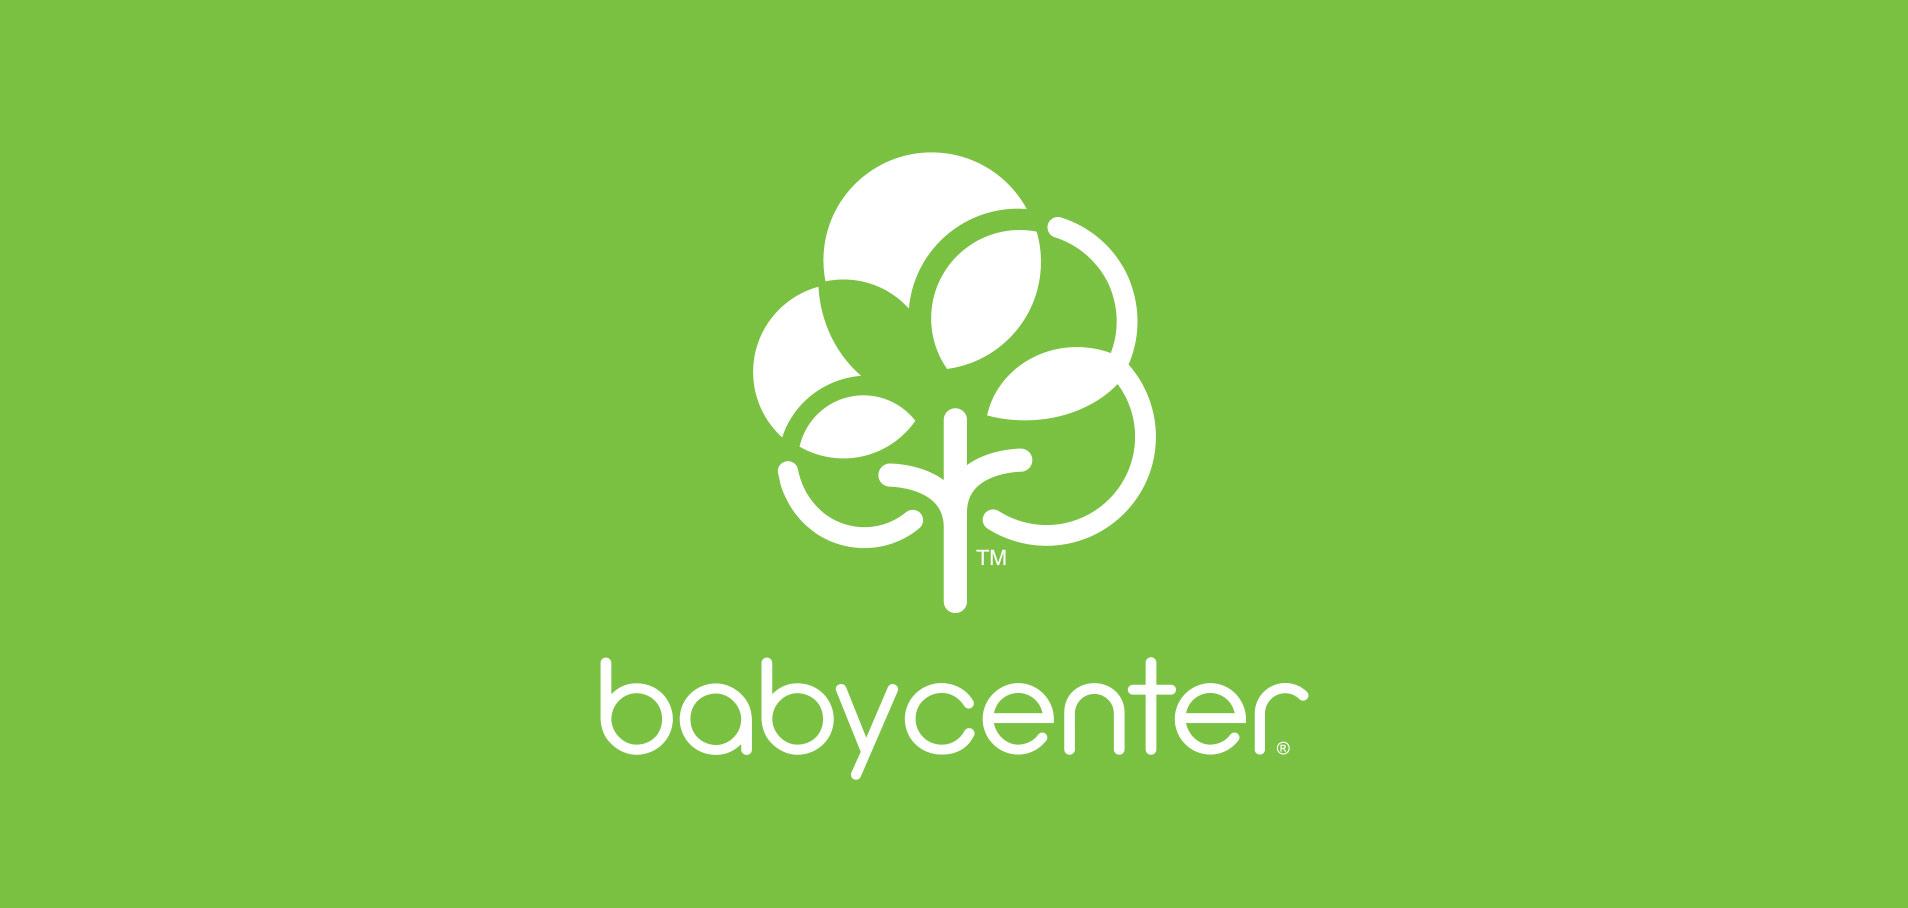 Baby center logo green image